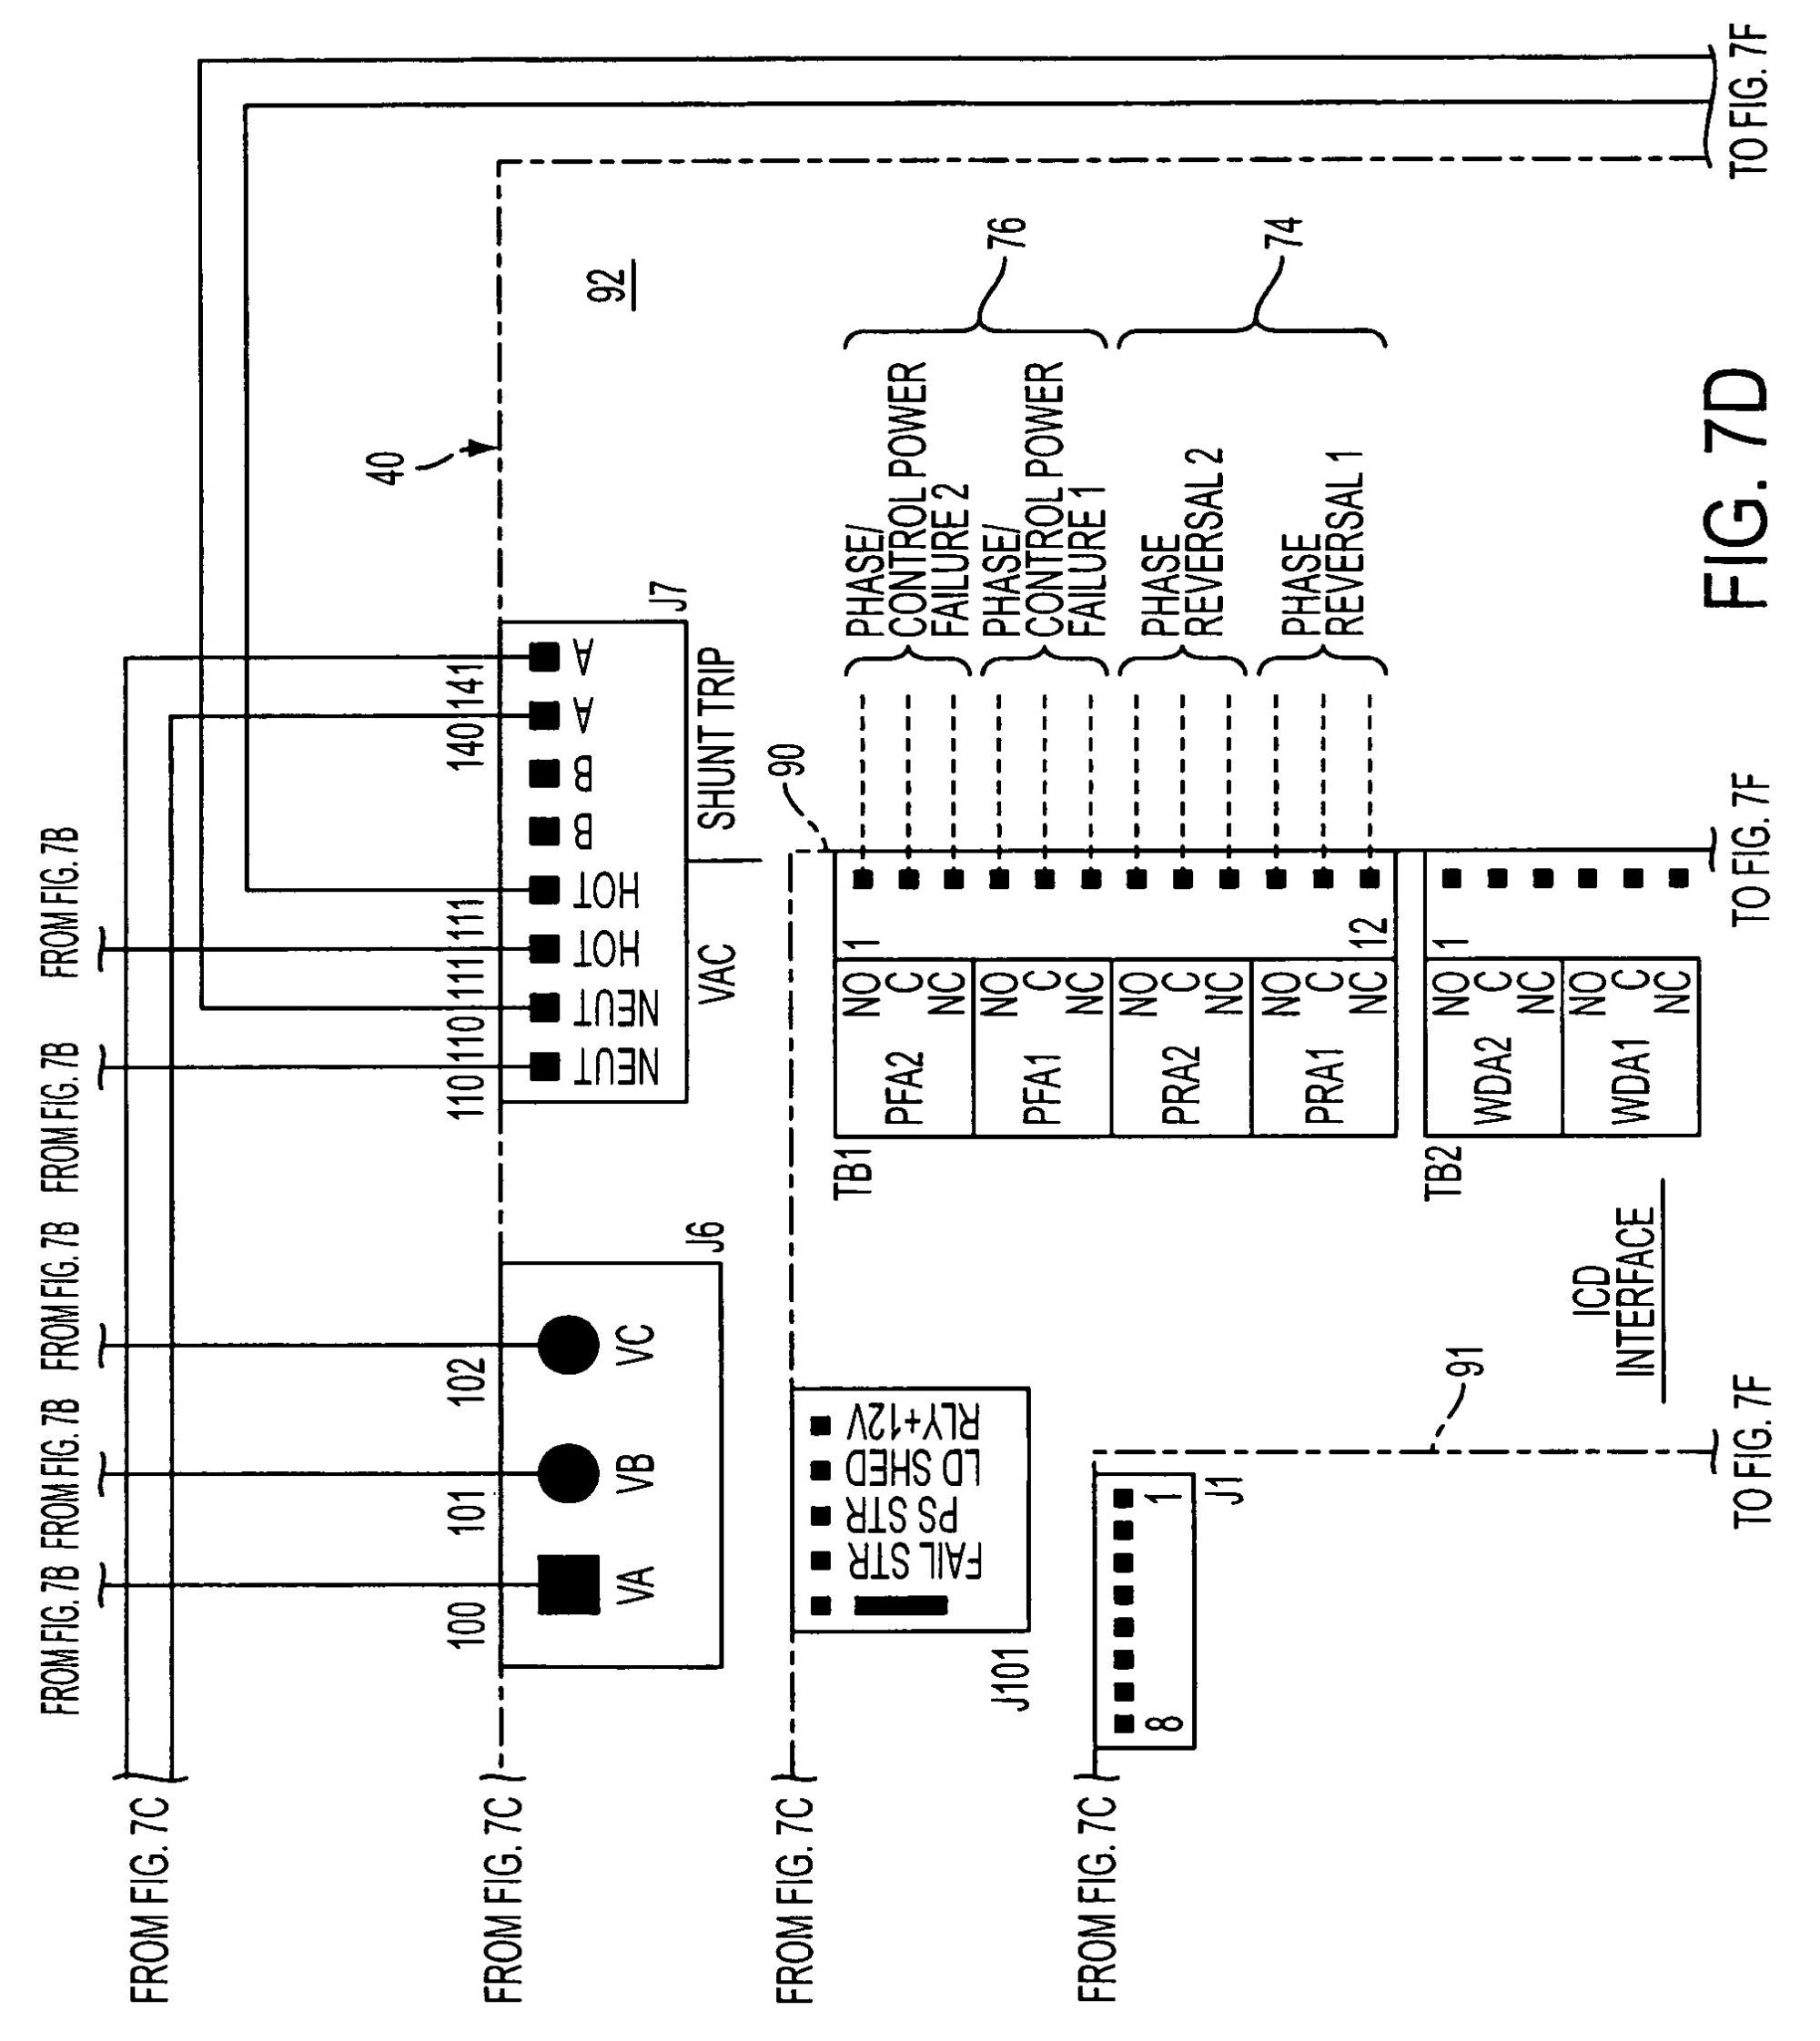 hight resolution of panel wiring diagram besides duplex pump control panel wiringduplex pump control panel wiring diagram free wiring